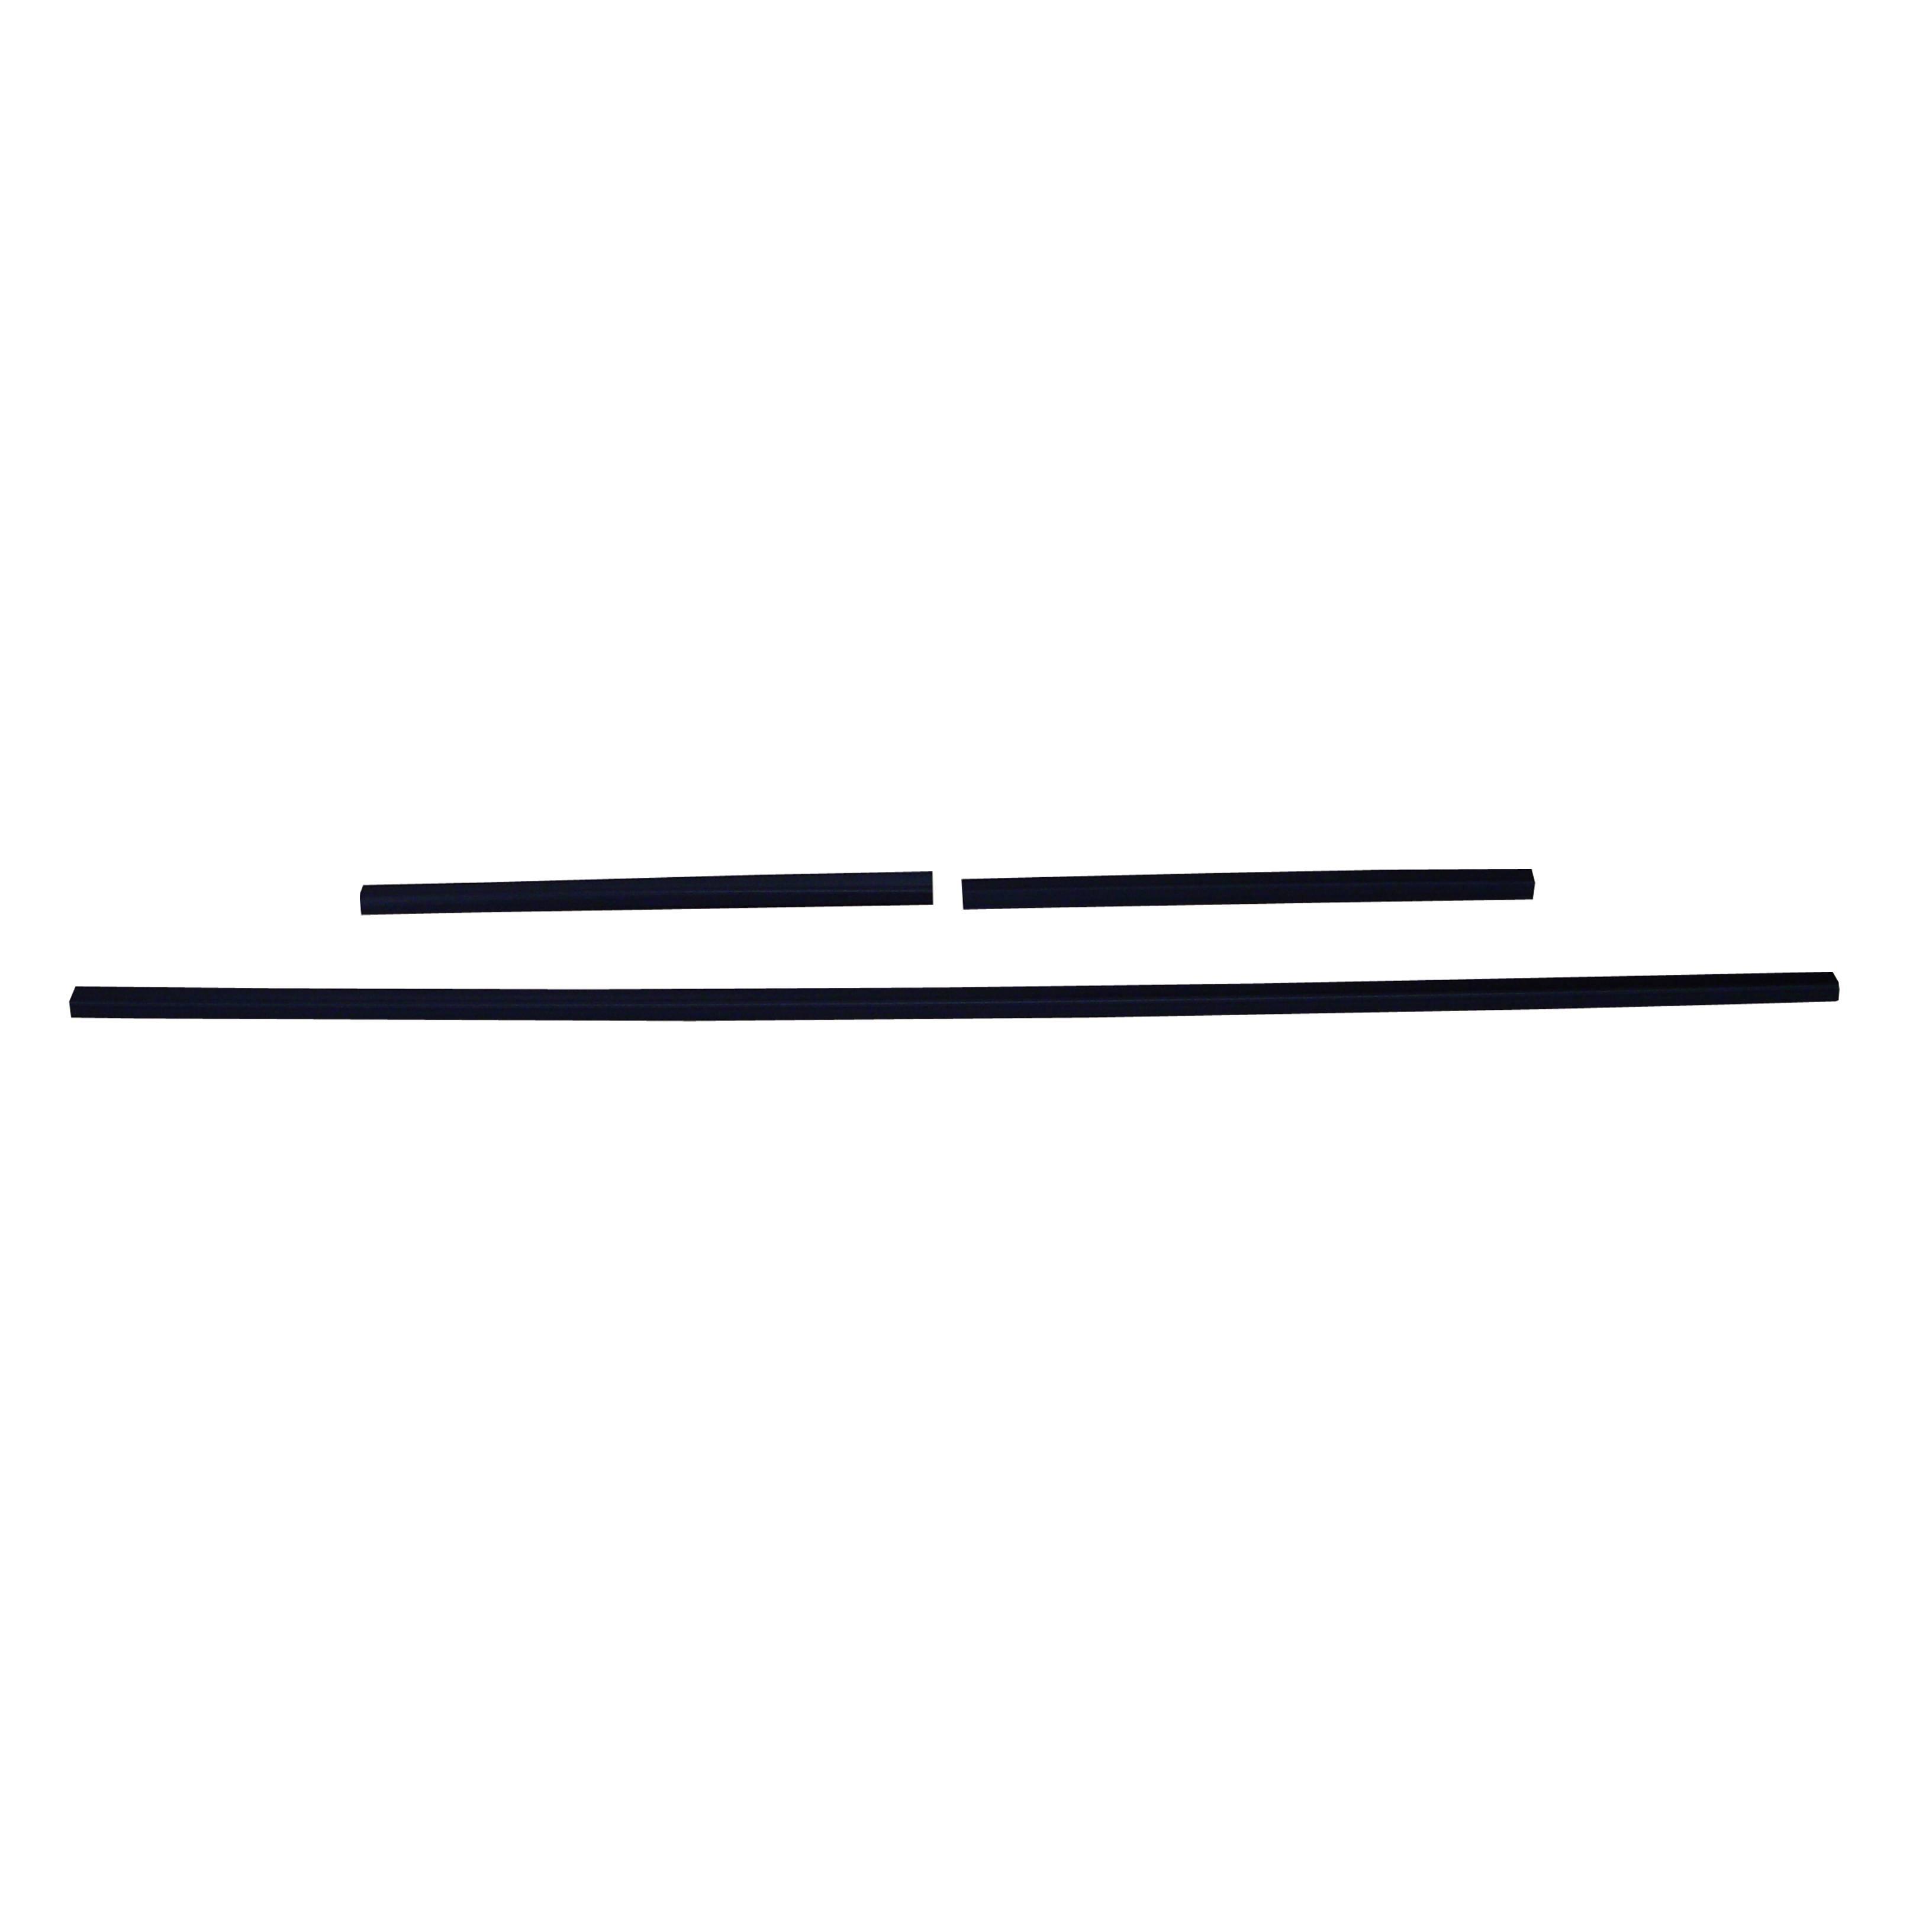 64/65 CHEVELLE/MALIBU REAR WINDOW TRIM - 3 PIECE